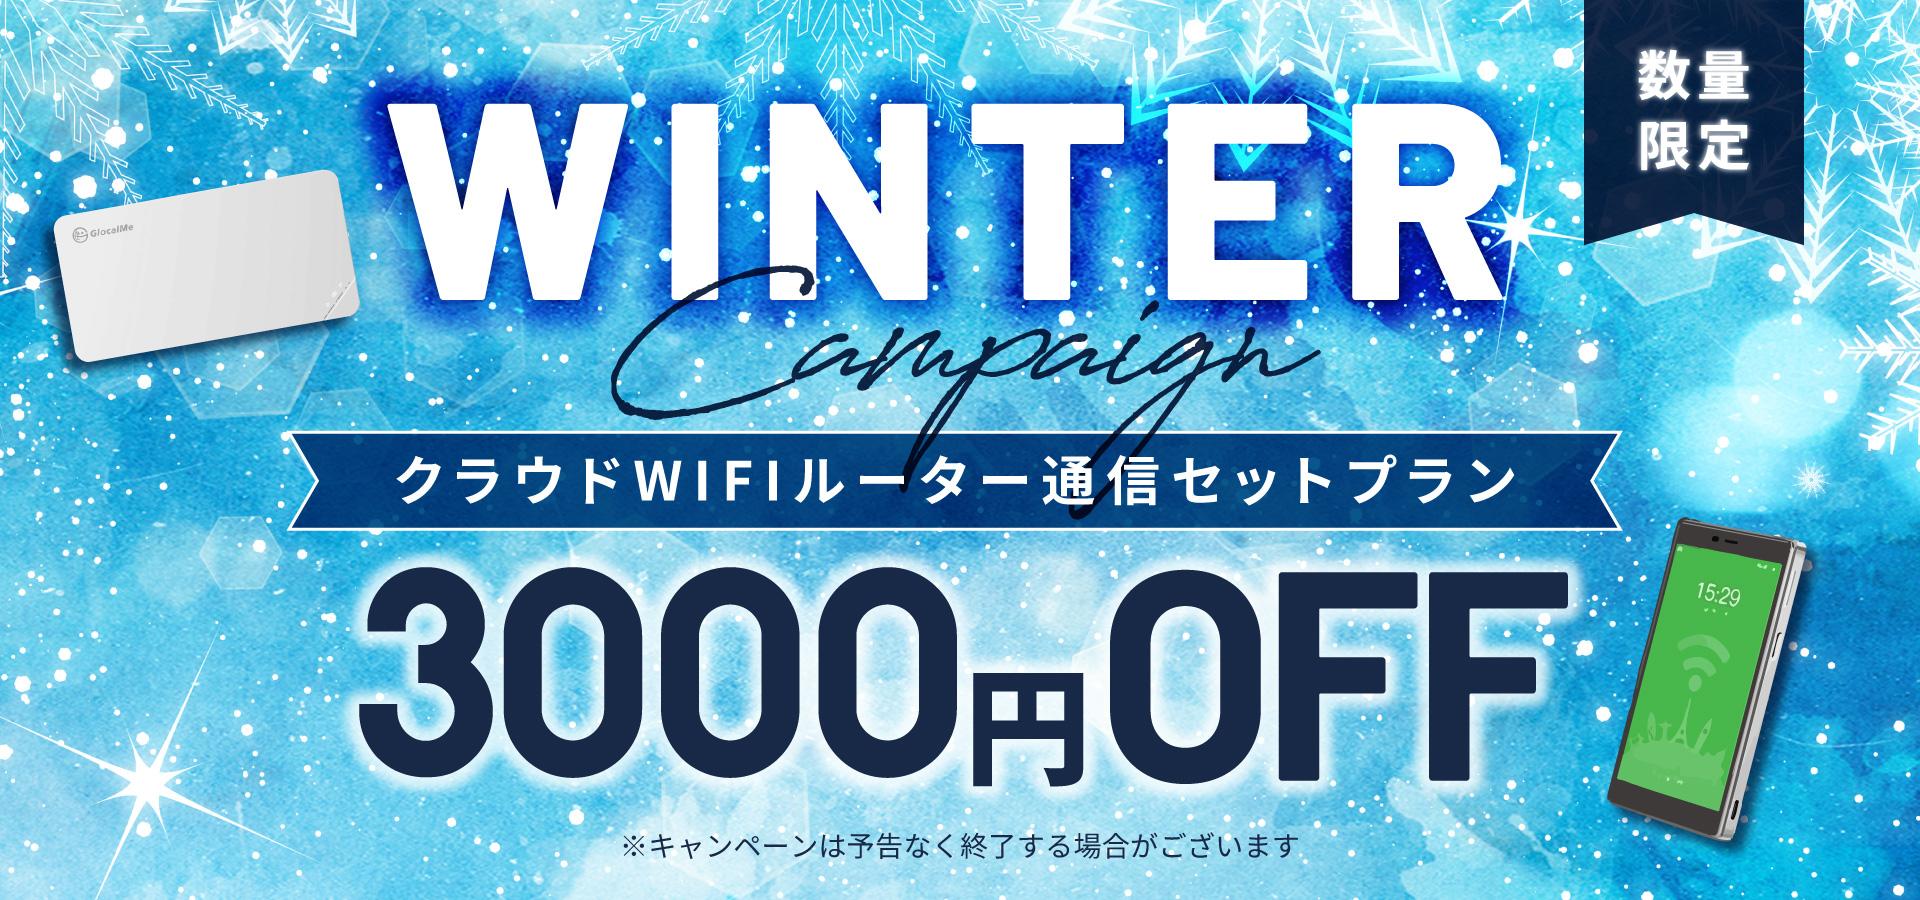 SoftBank低容量プリペイドSIM2